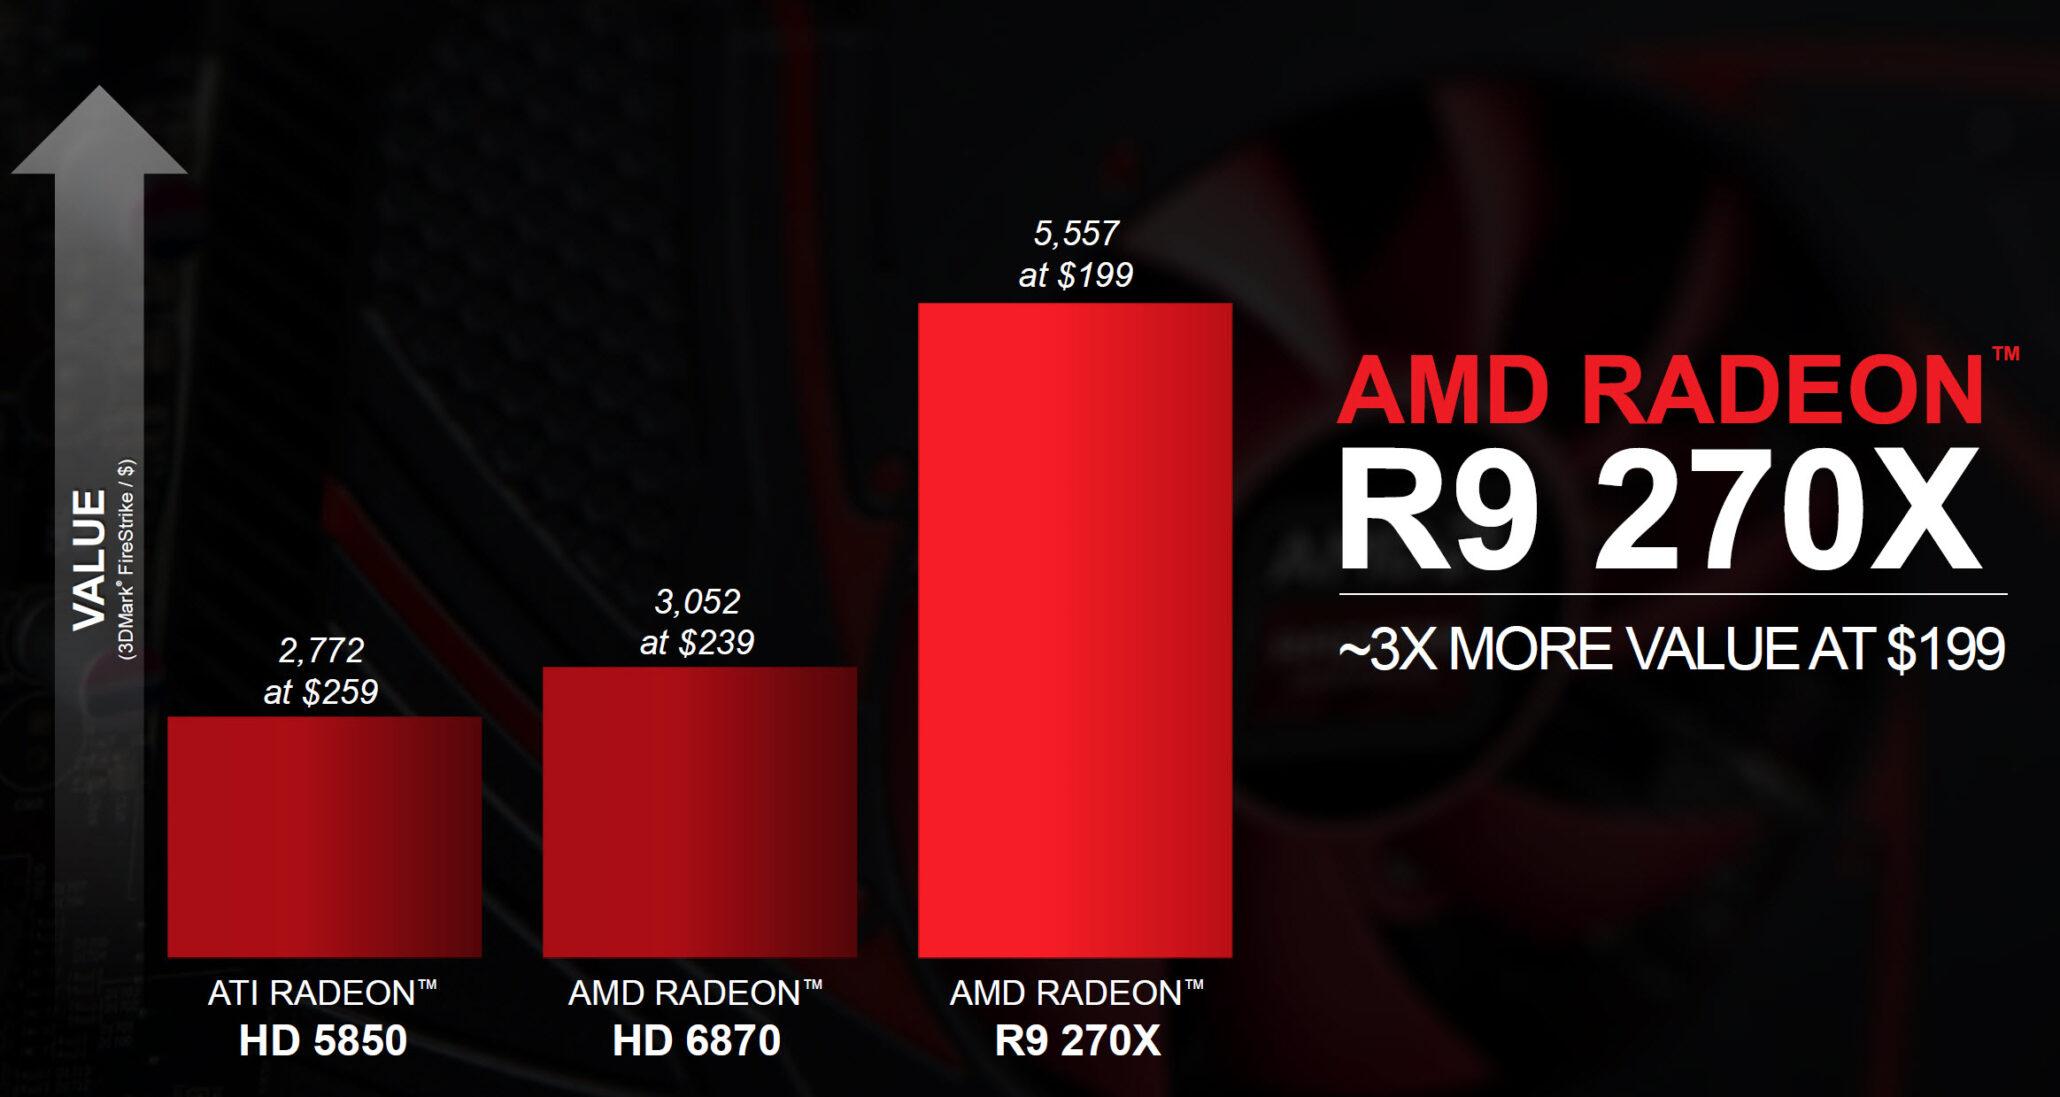 amd-r9-270x-performance